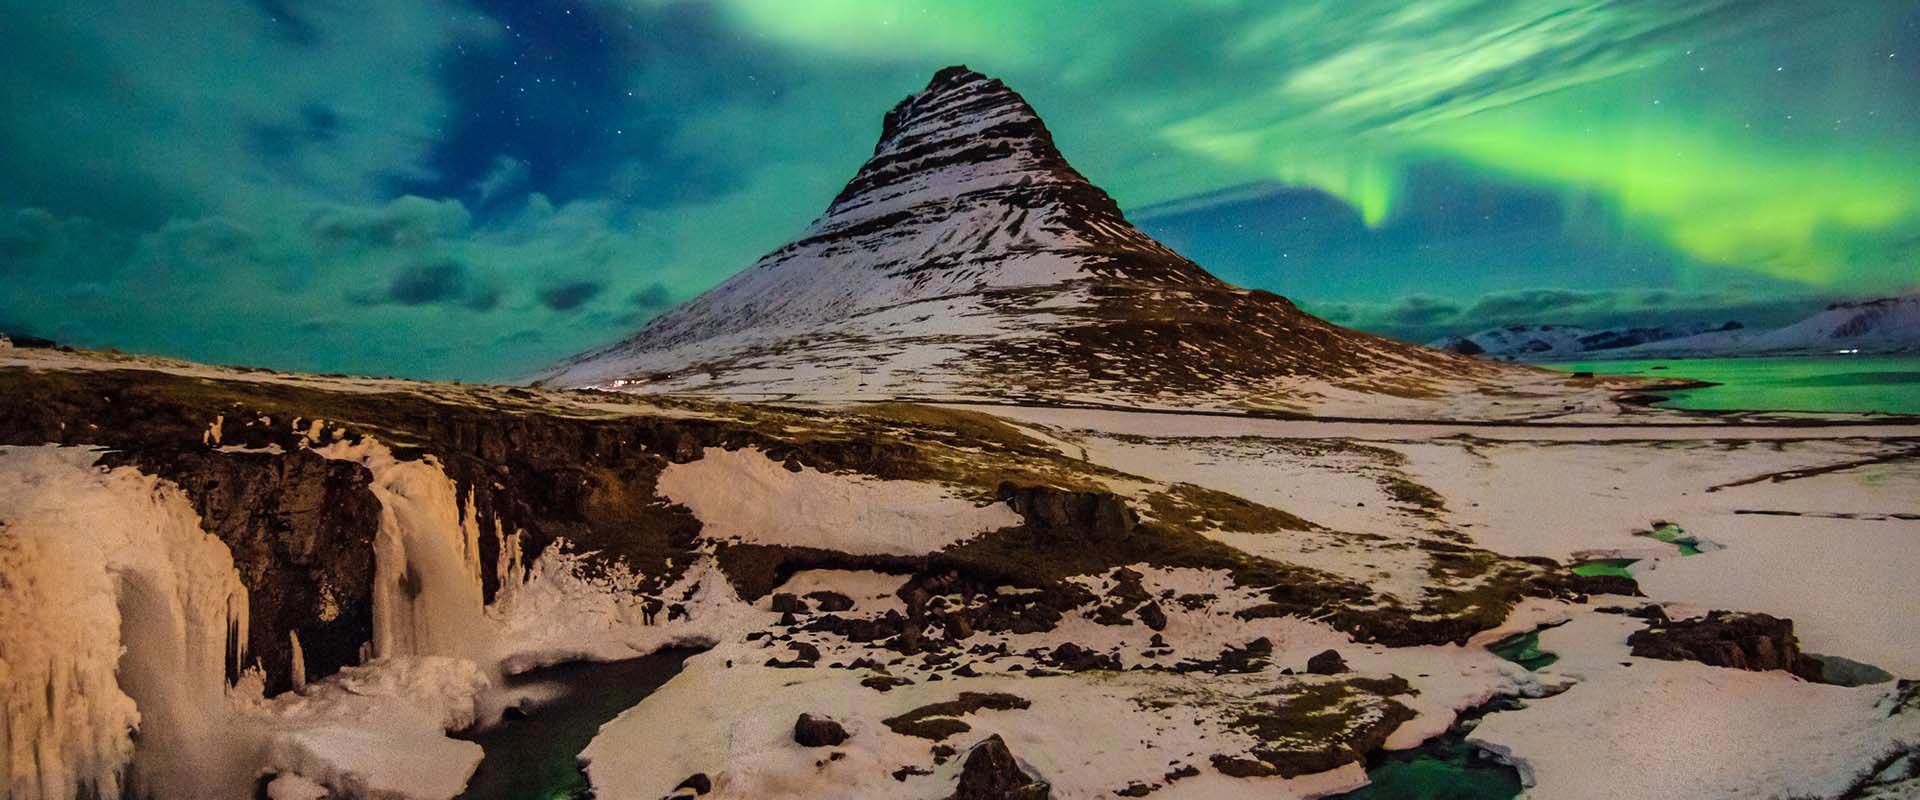 Iceland Public Holidays 2021 Publicholidays Eu